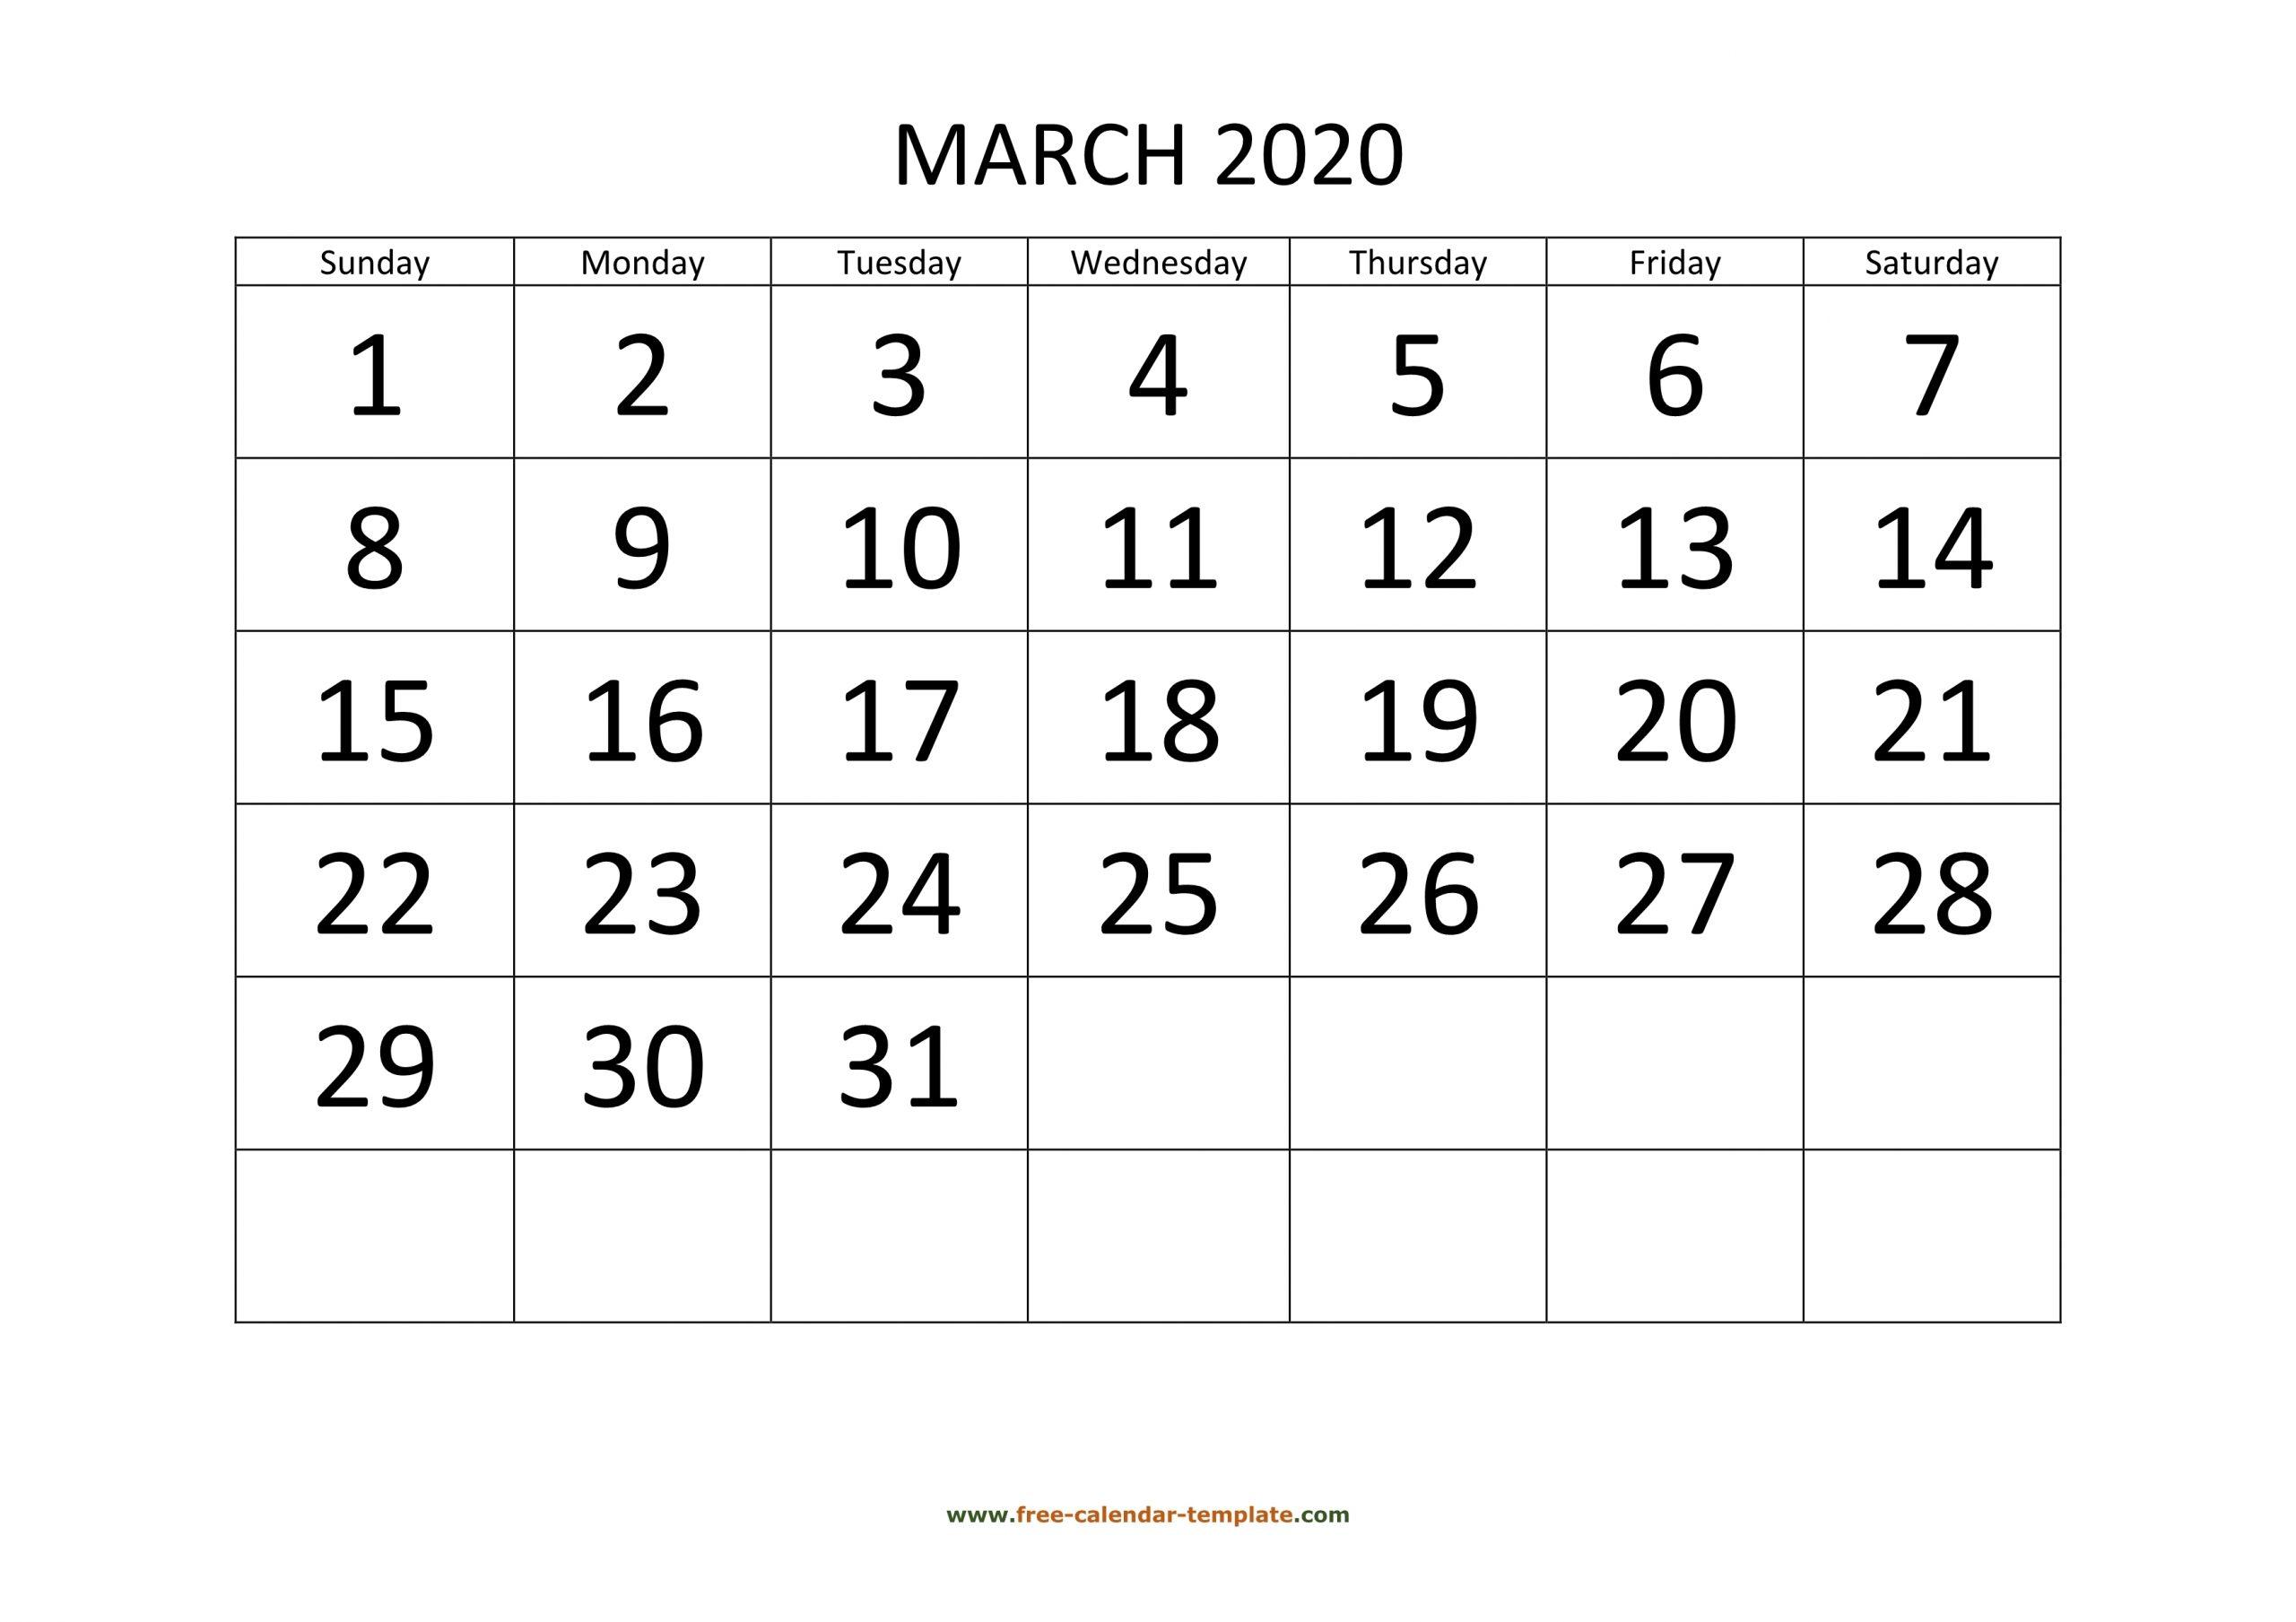 March 2020 Free Calendar Tempplate | Free-Calendar-Template regarding Free Printable 2020 Calendars Large Numbers